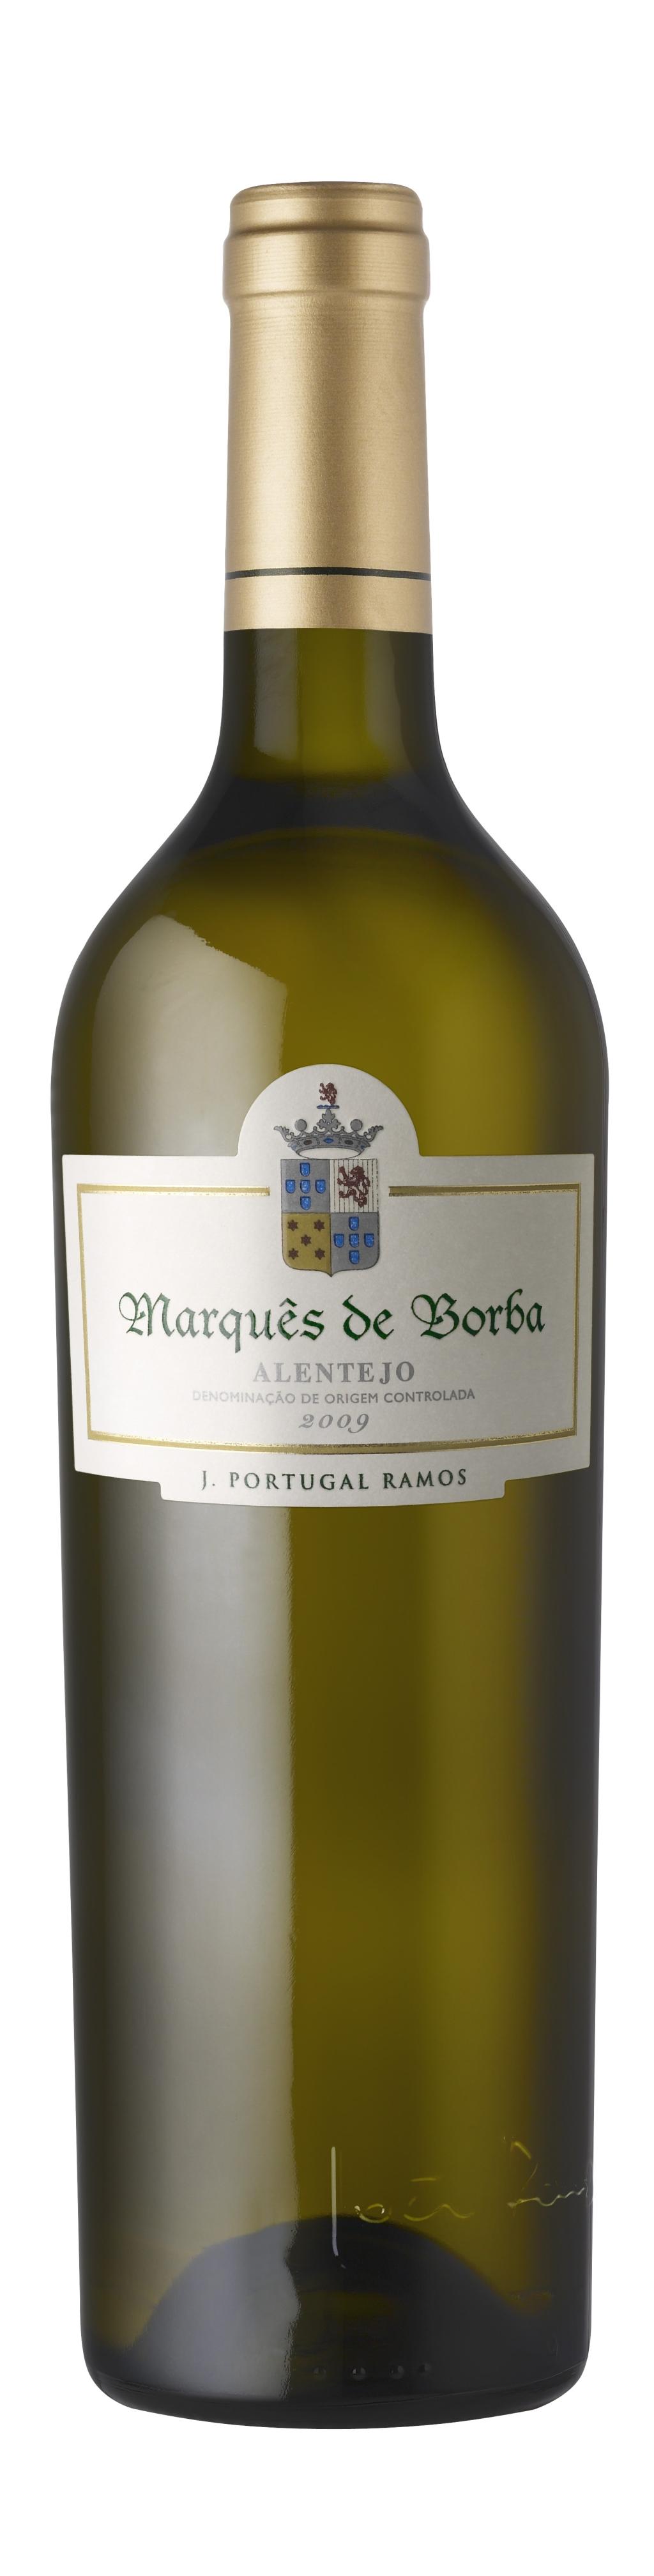 marques_de_borba